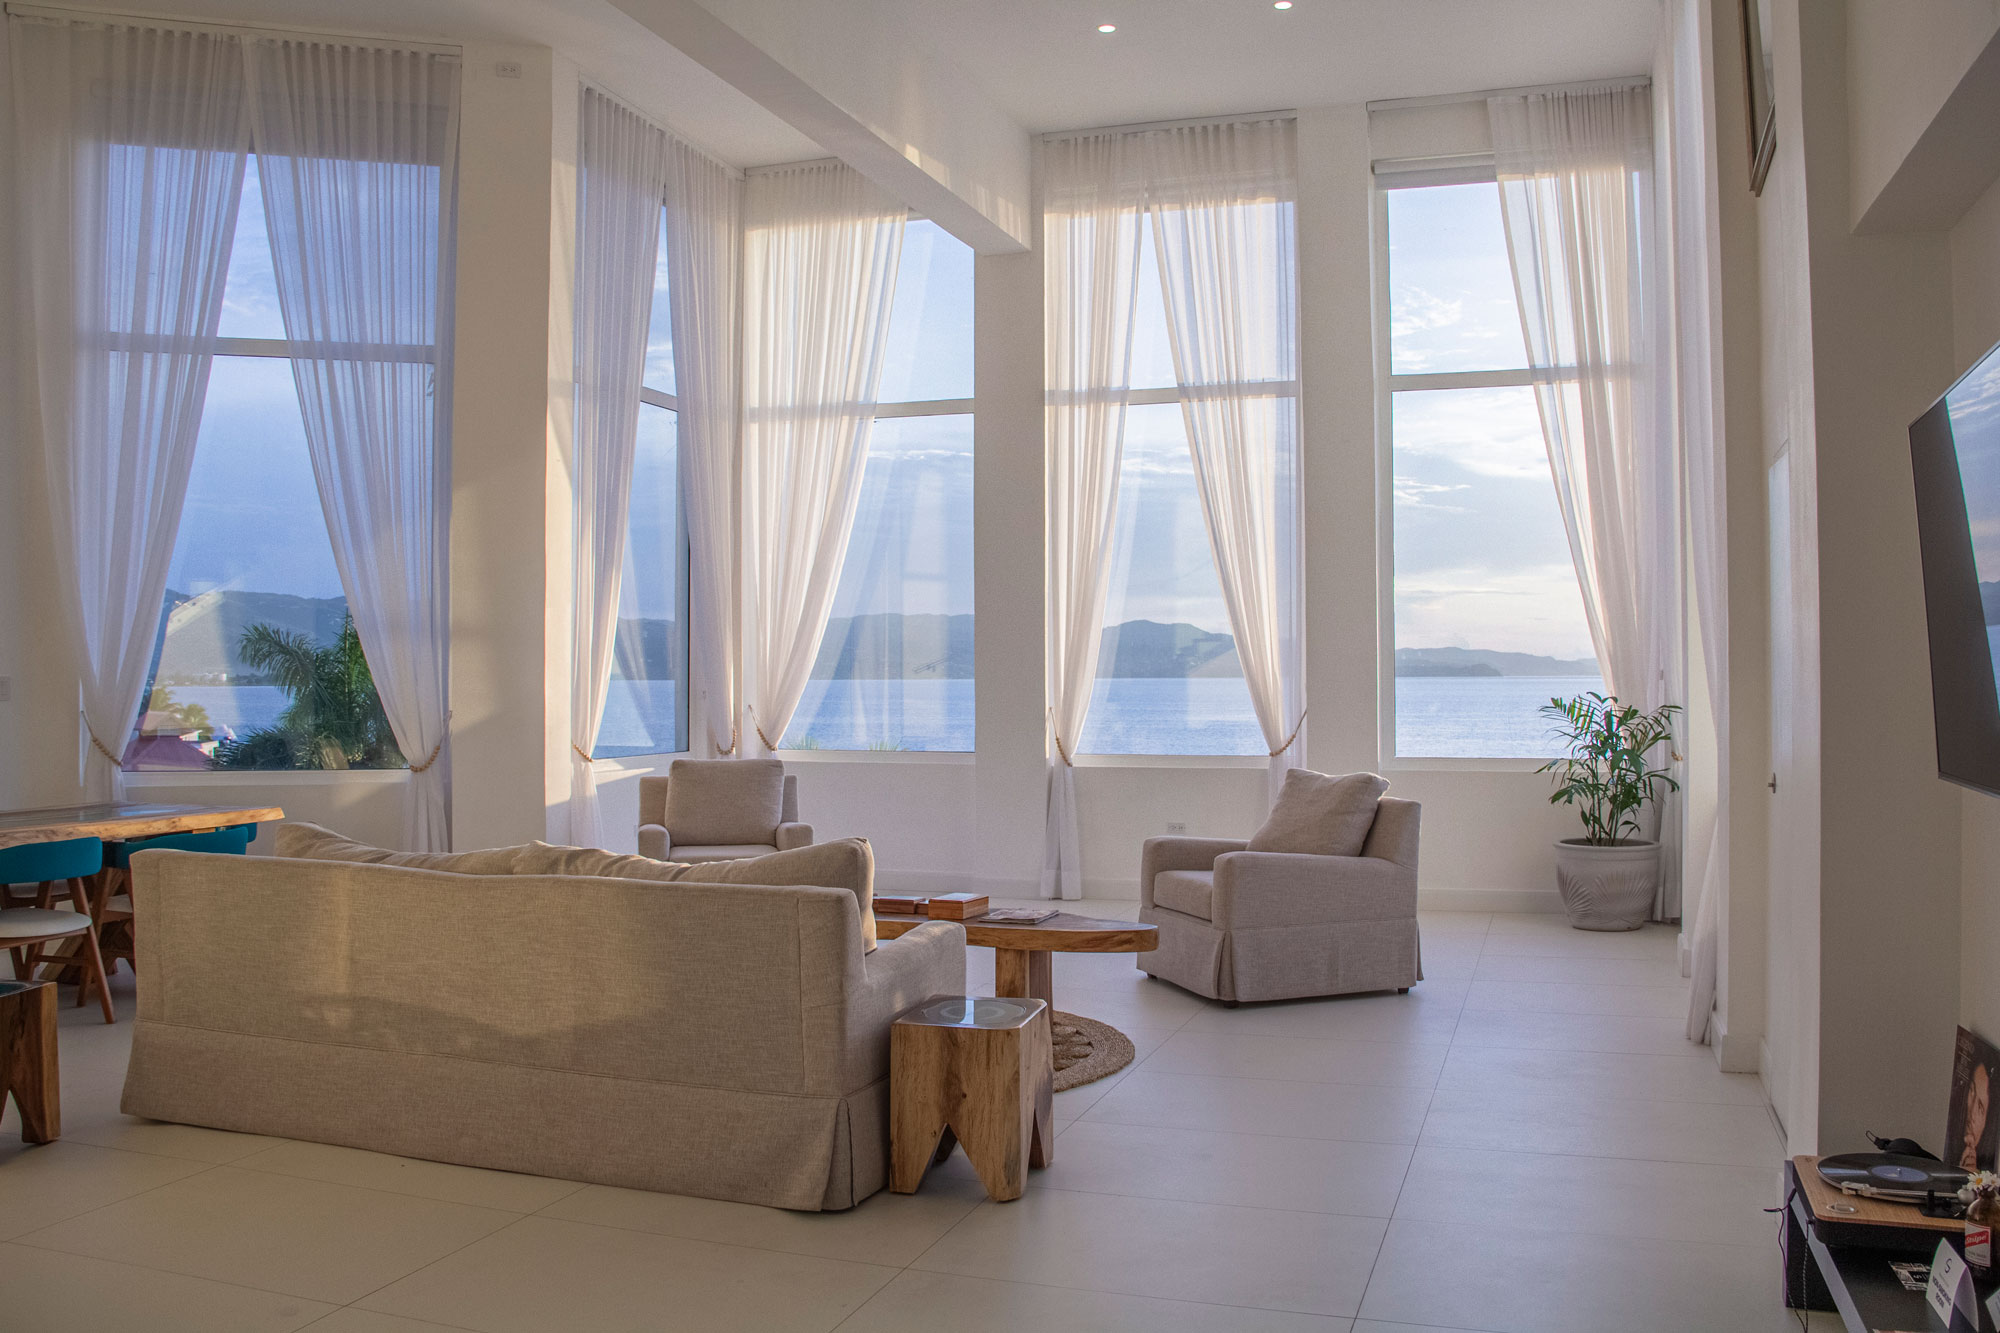 Spanish Court Jamaica  - Dekton Zenith Hotel Jamaica S Flooring4 52